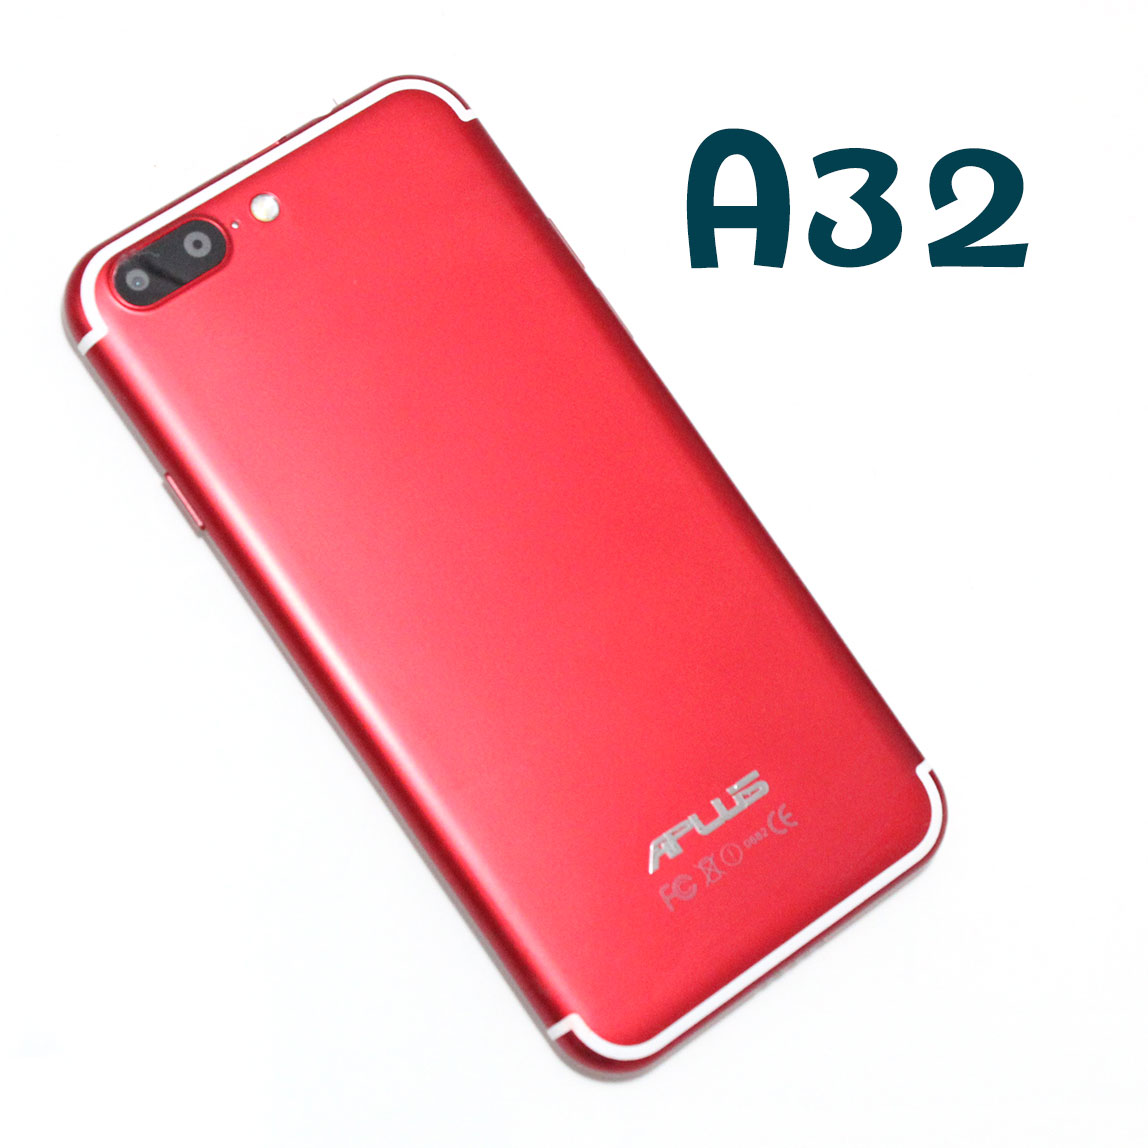 APLUS A32 new หน้า i7 จอ 5 นิ้ว ระบบ 3G